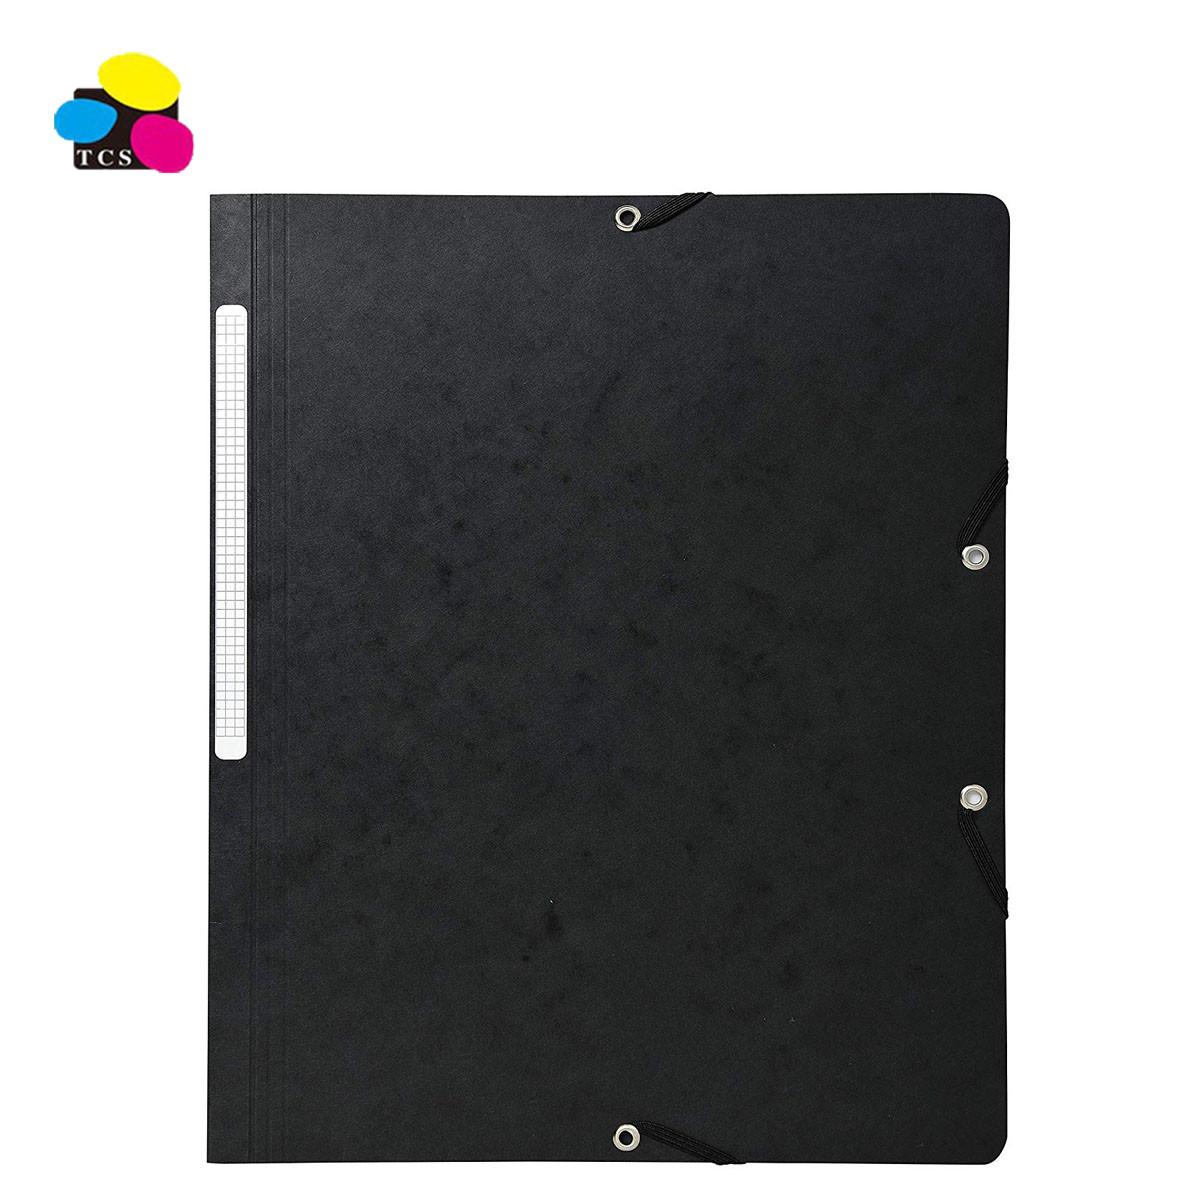 stationery folder supplier 350G Pressboard Holding 200 Sheets Elastic Bands Folders Without Flap